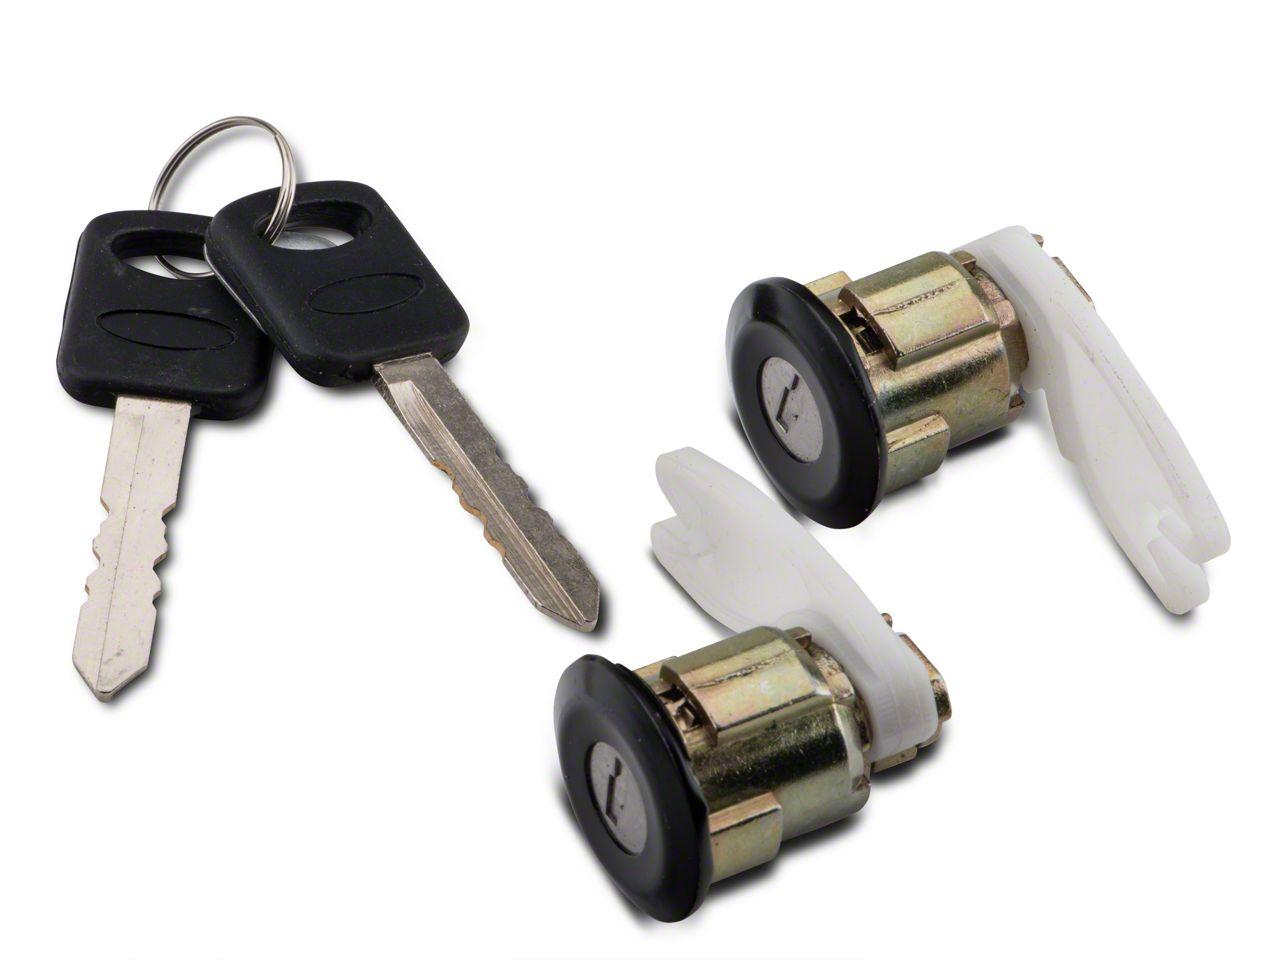 1996-2004 Mustang /& Cobra Outside Door Lock Set LH /& RH W// Black Bezels /& Keys